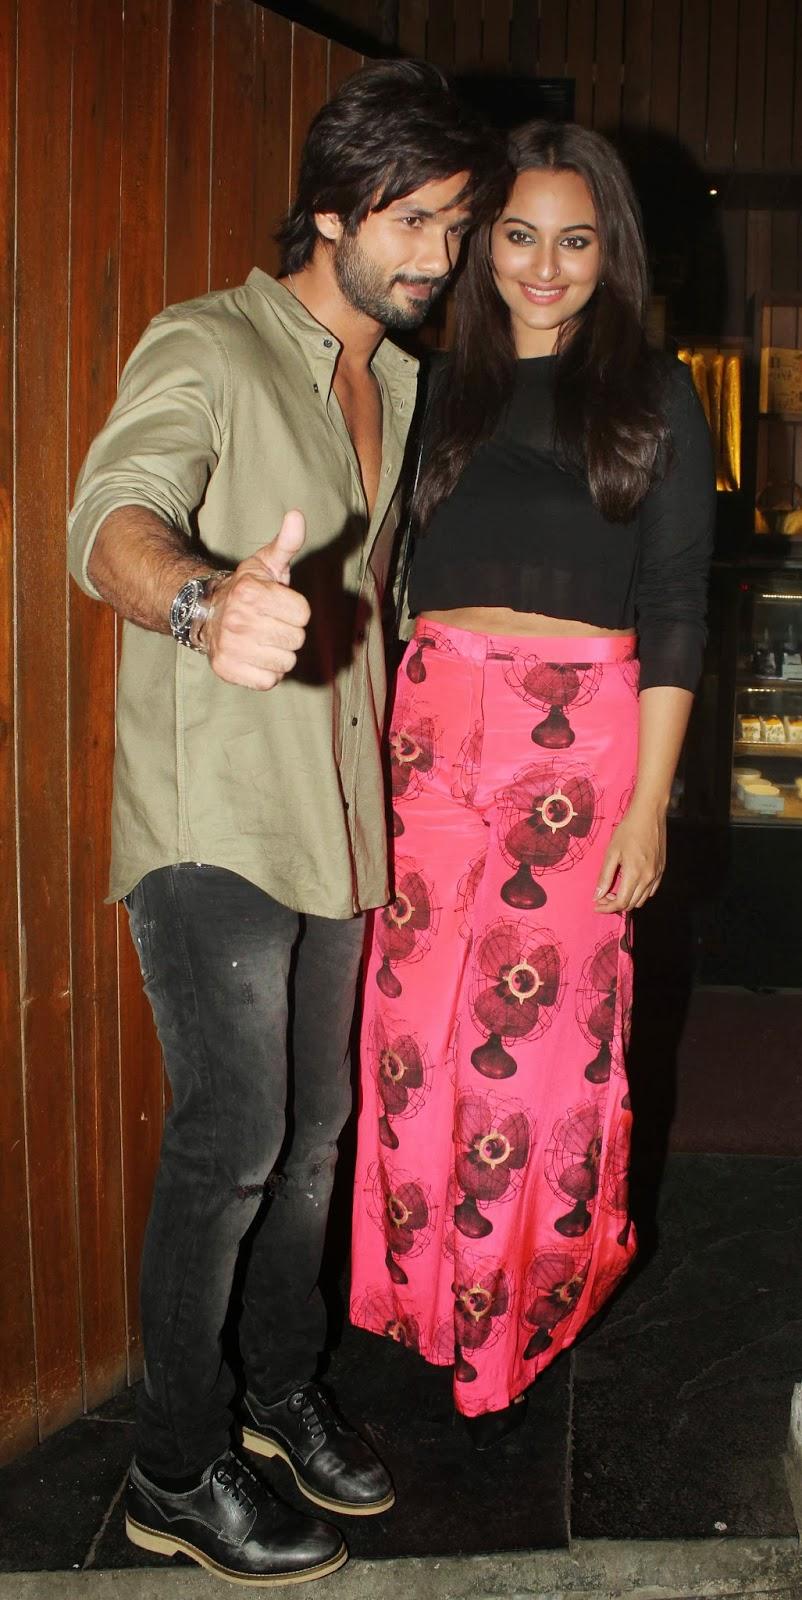 sonakshi sinha and shahid kapoor dating